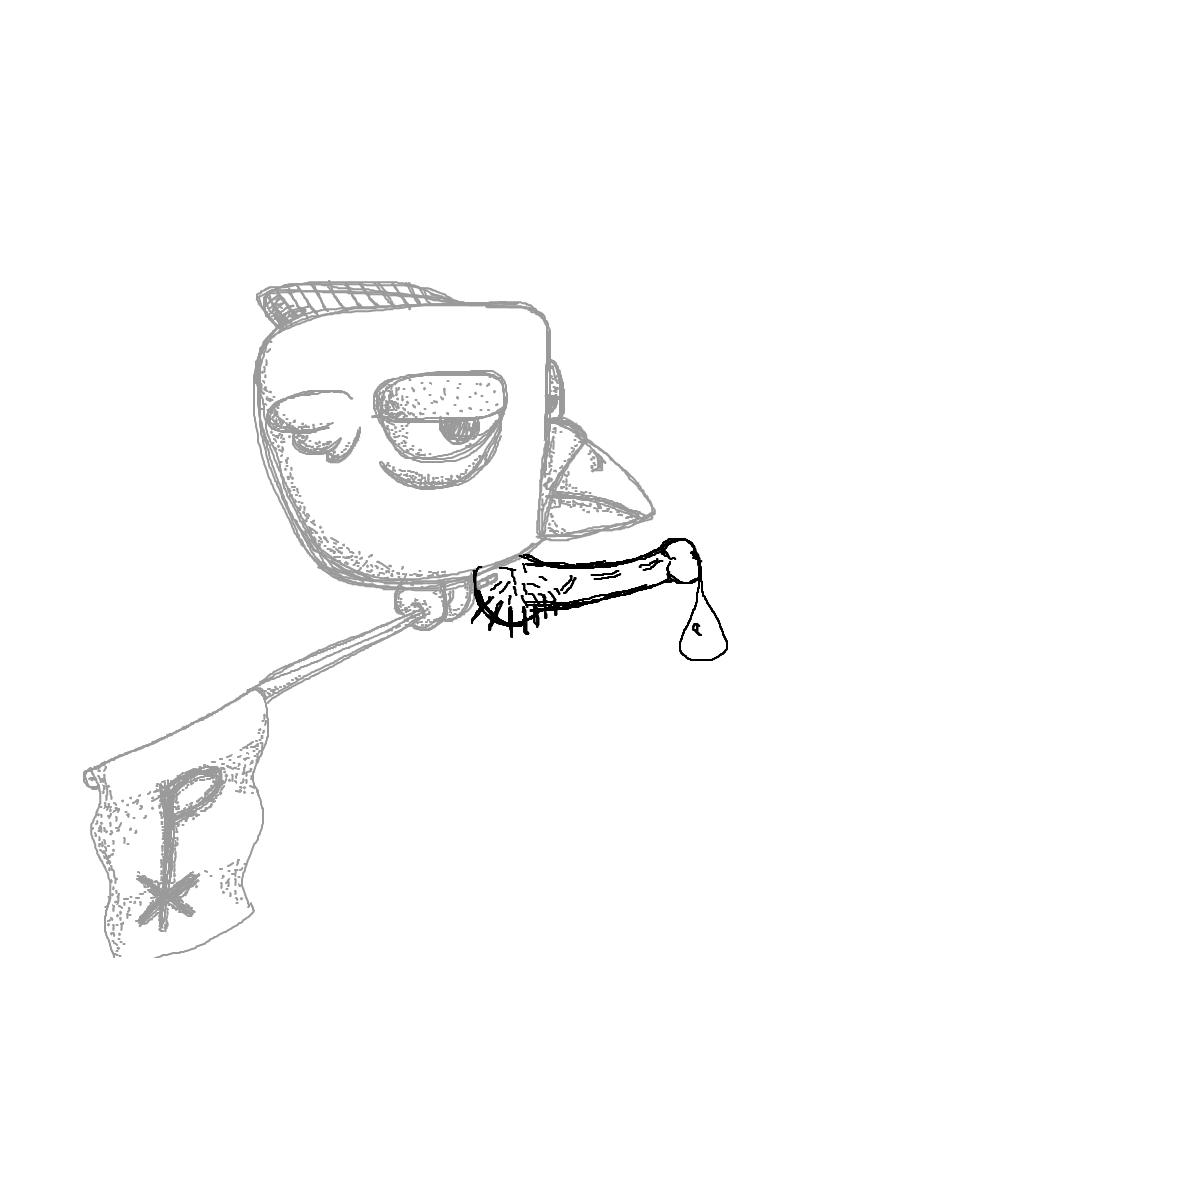 BAAAM drawing#2083 lat:43.3932952880859400lng: -1.7886232137680054